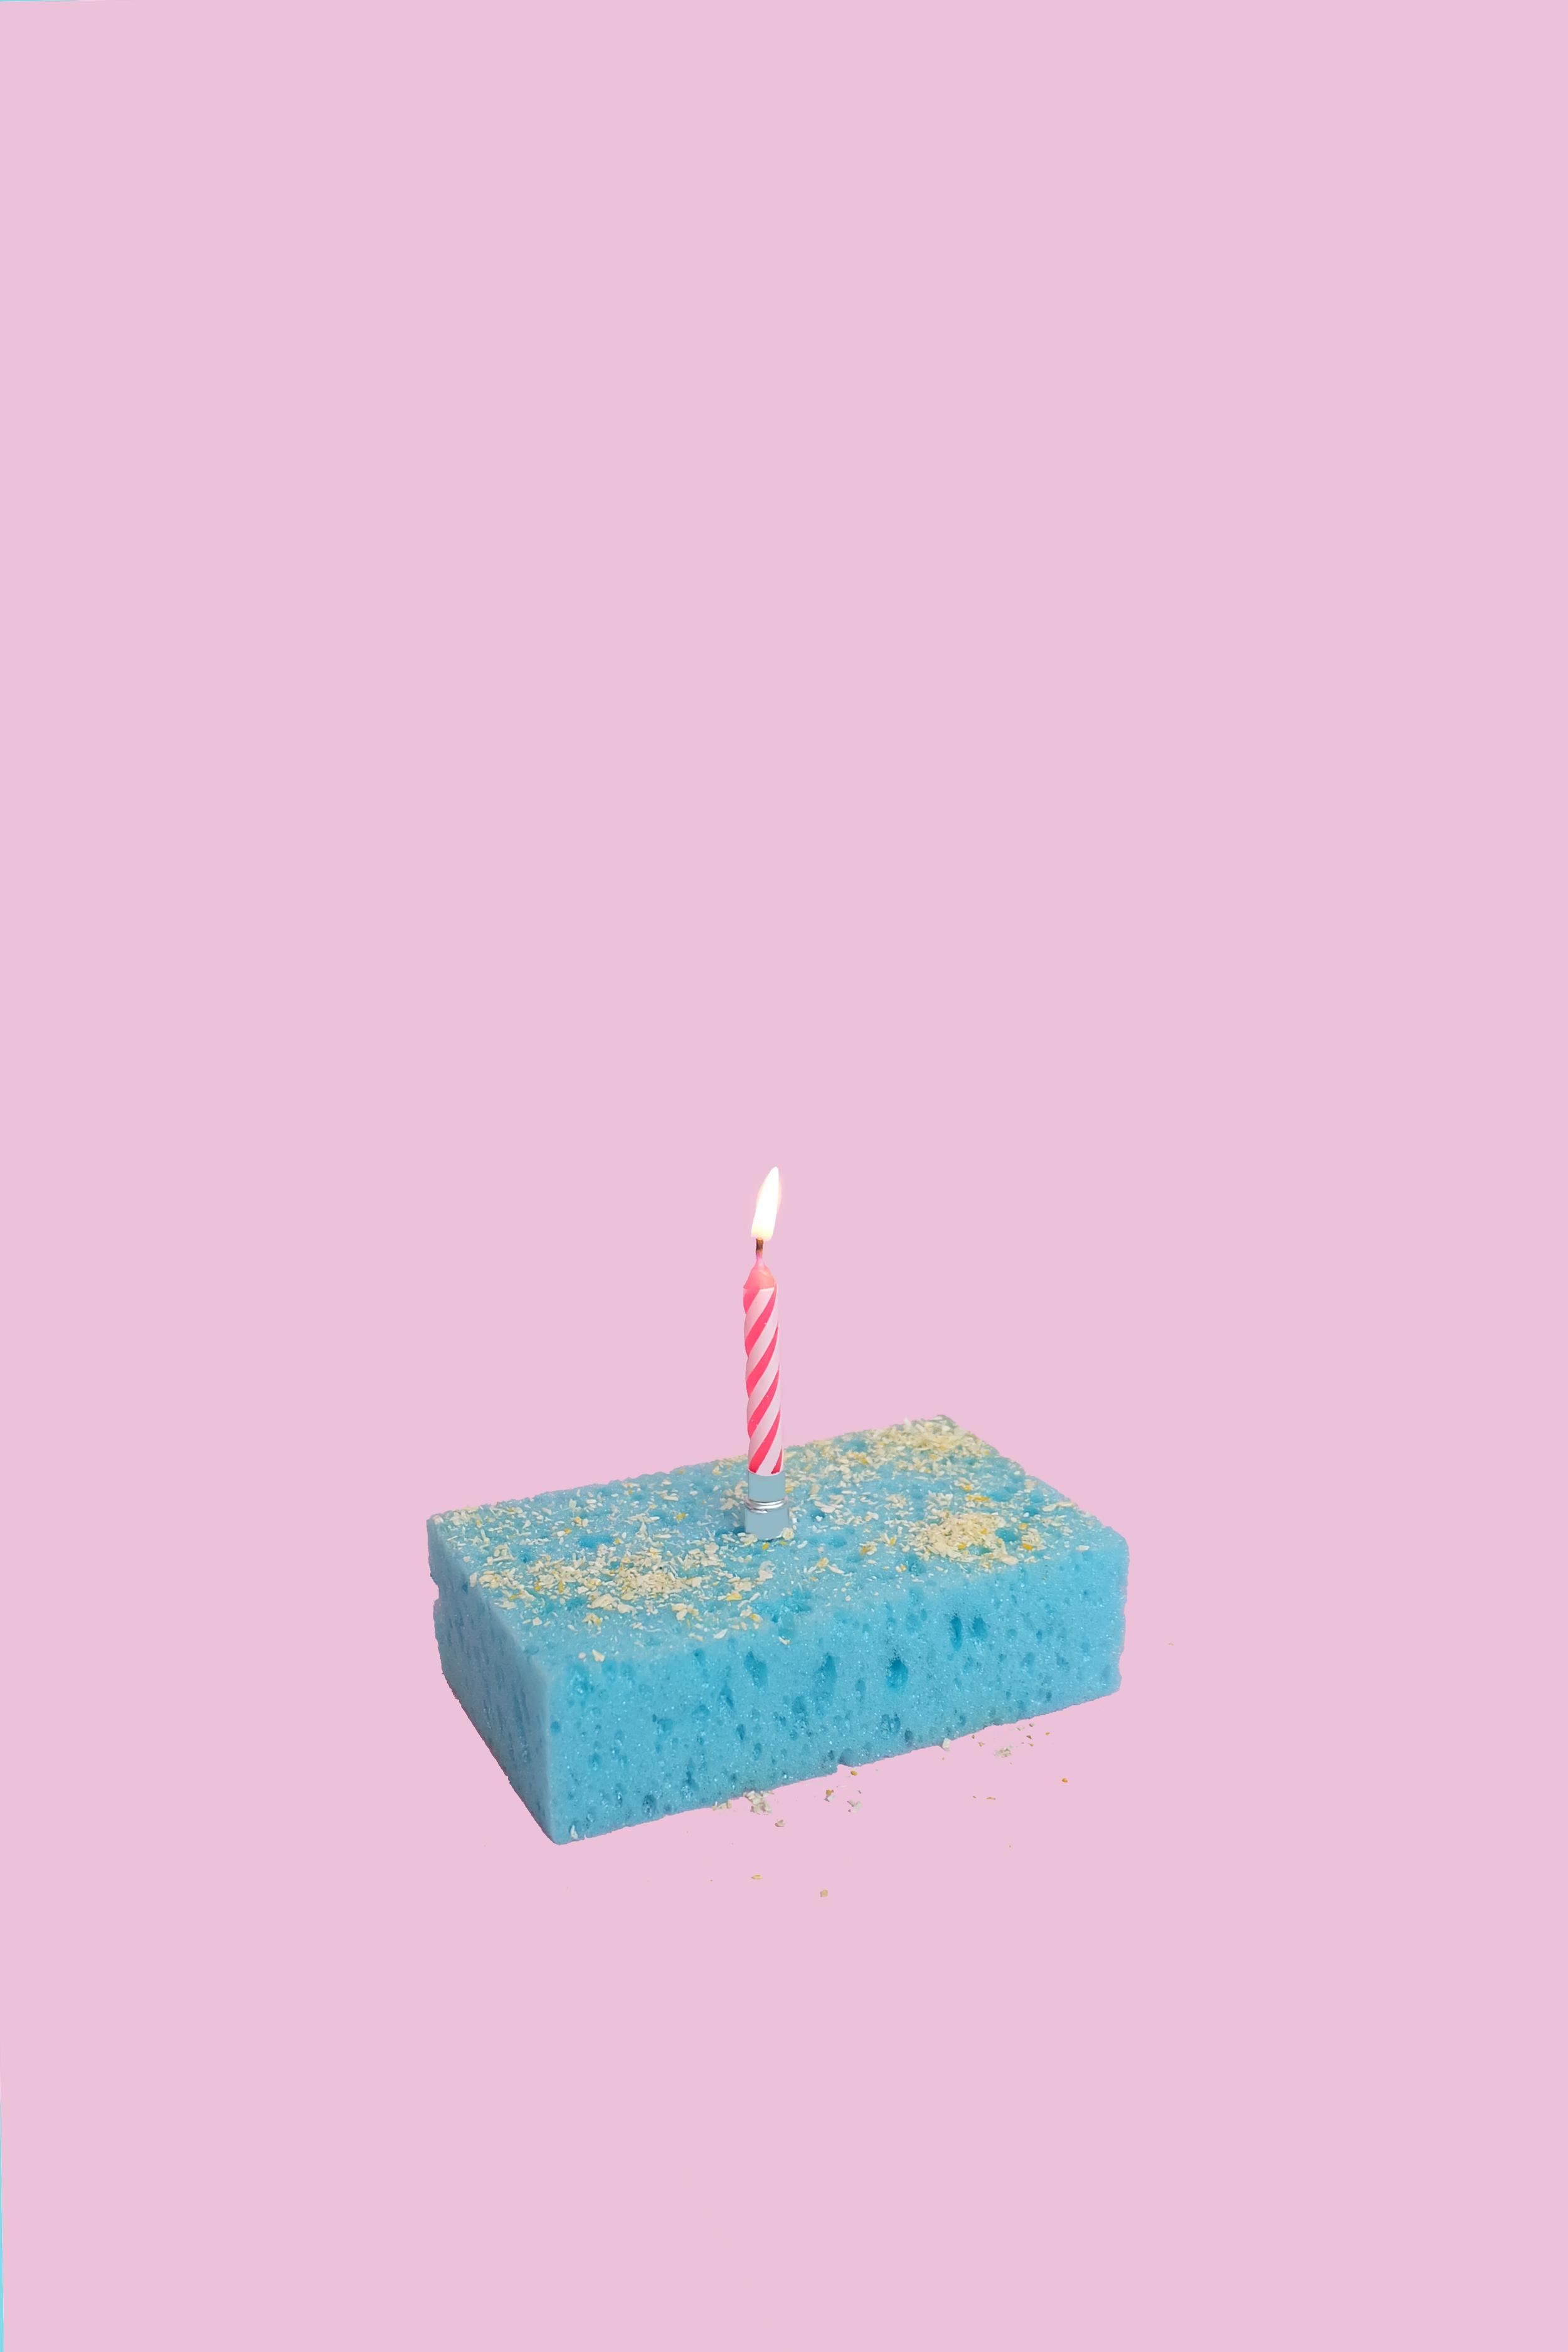 birthday_sponge.png